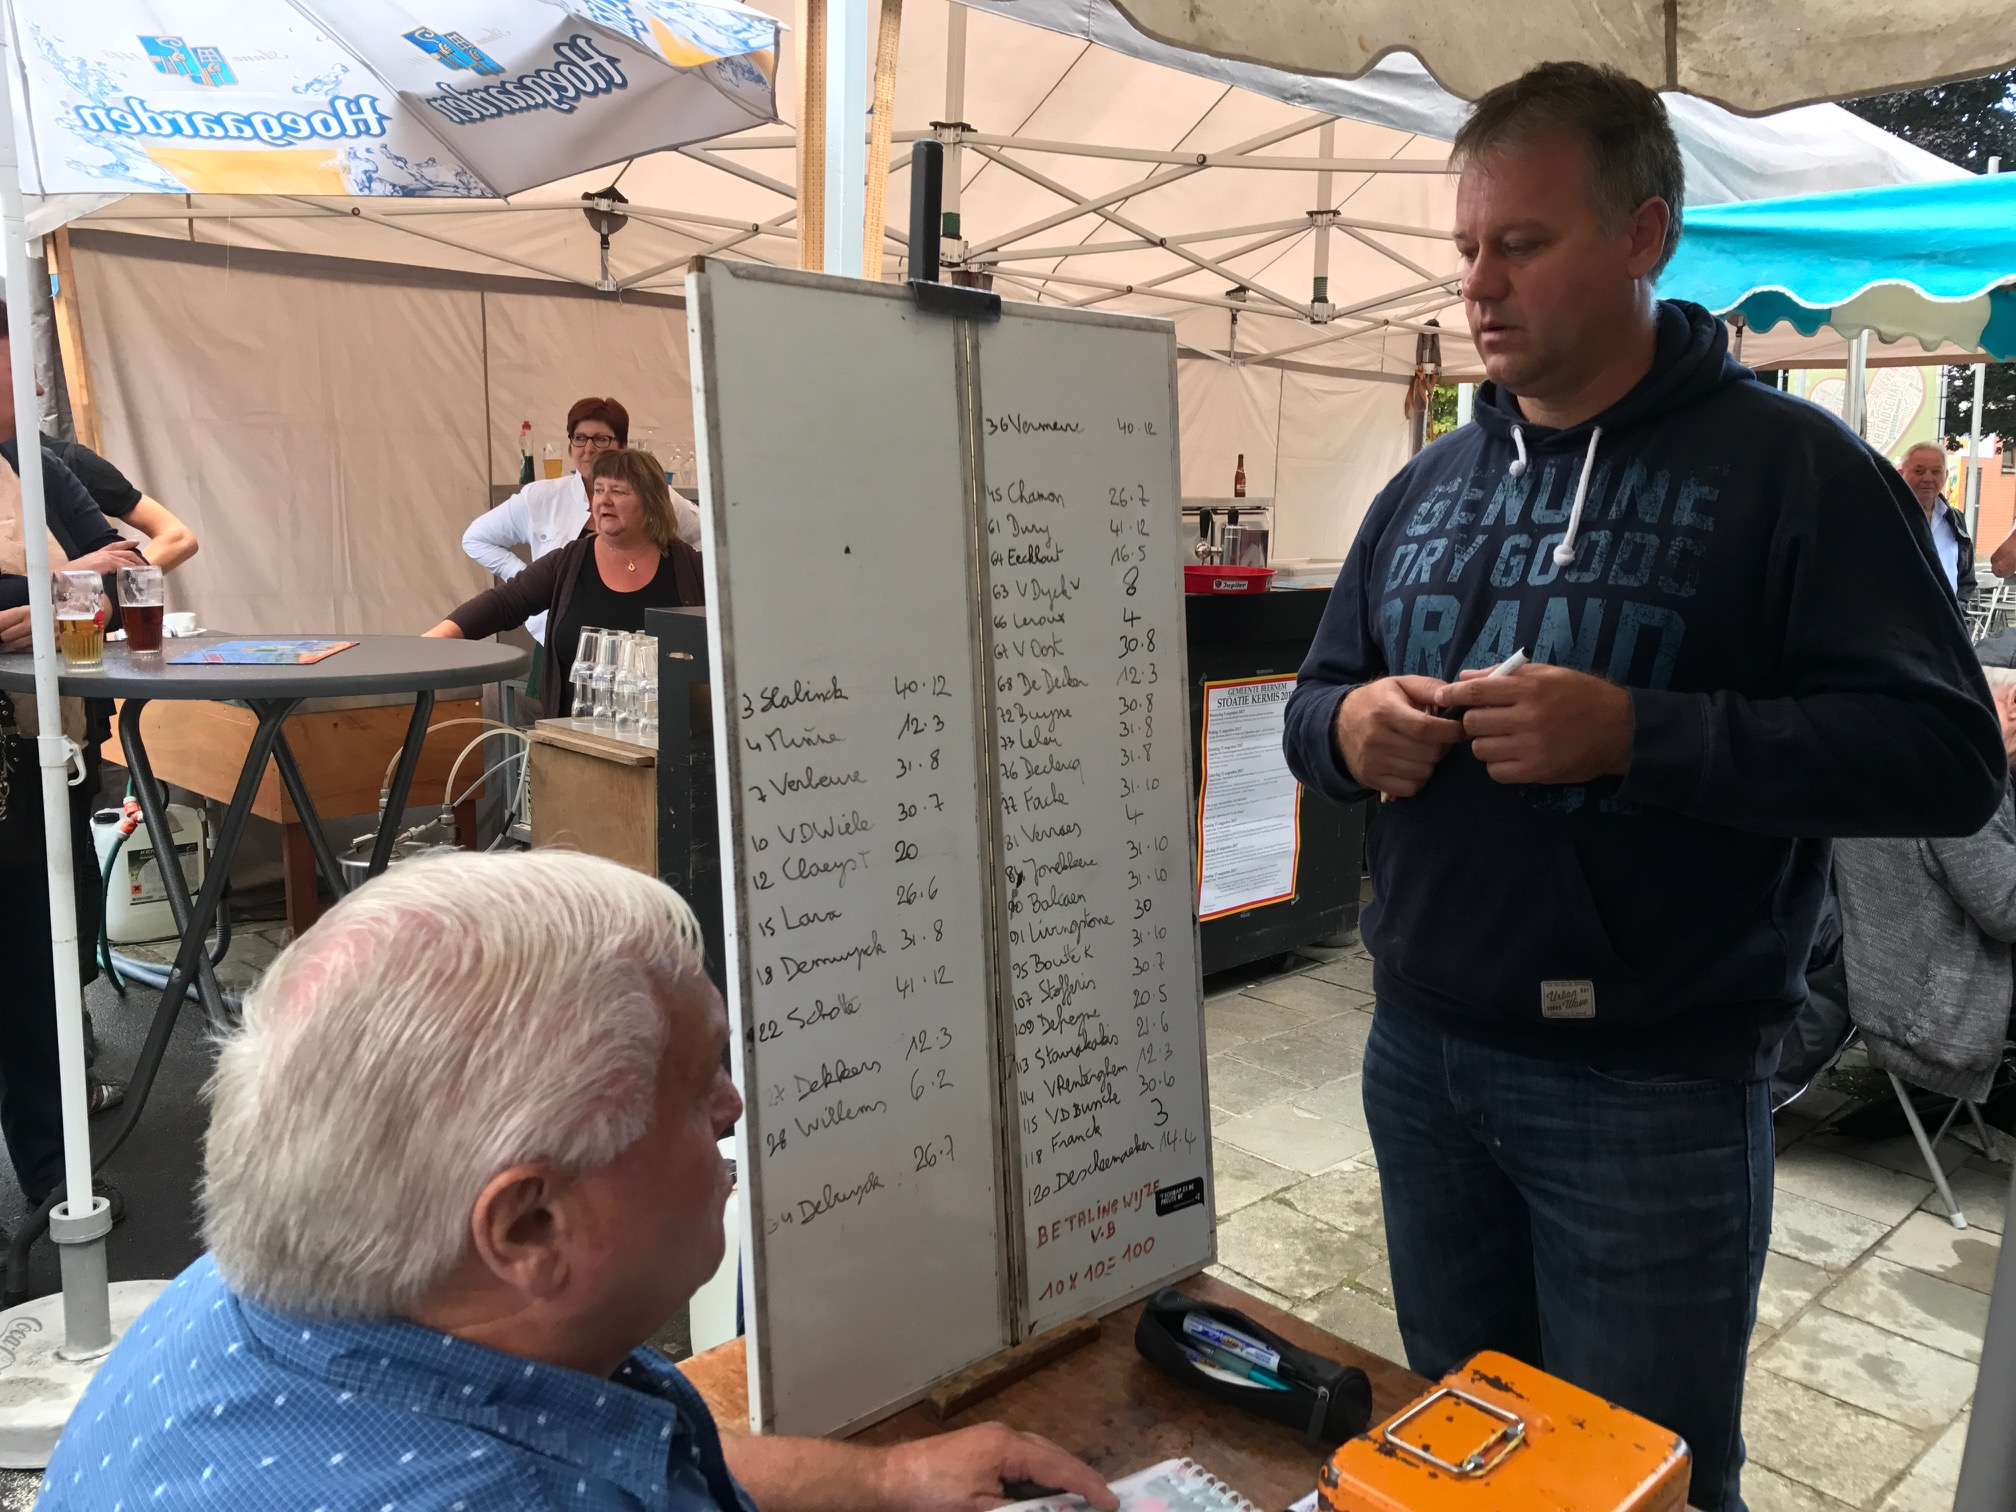 Beernam 17 - Belgian bookmakers in action at the Beernam kermesse. What price for Peter van der Livingstone at the next Flemish kermesse ?